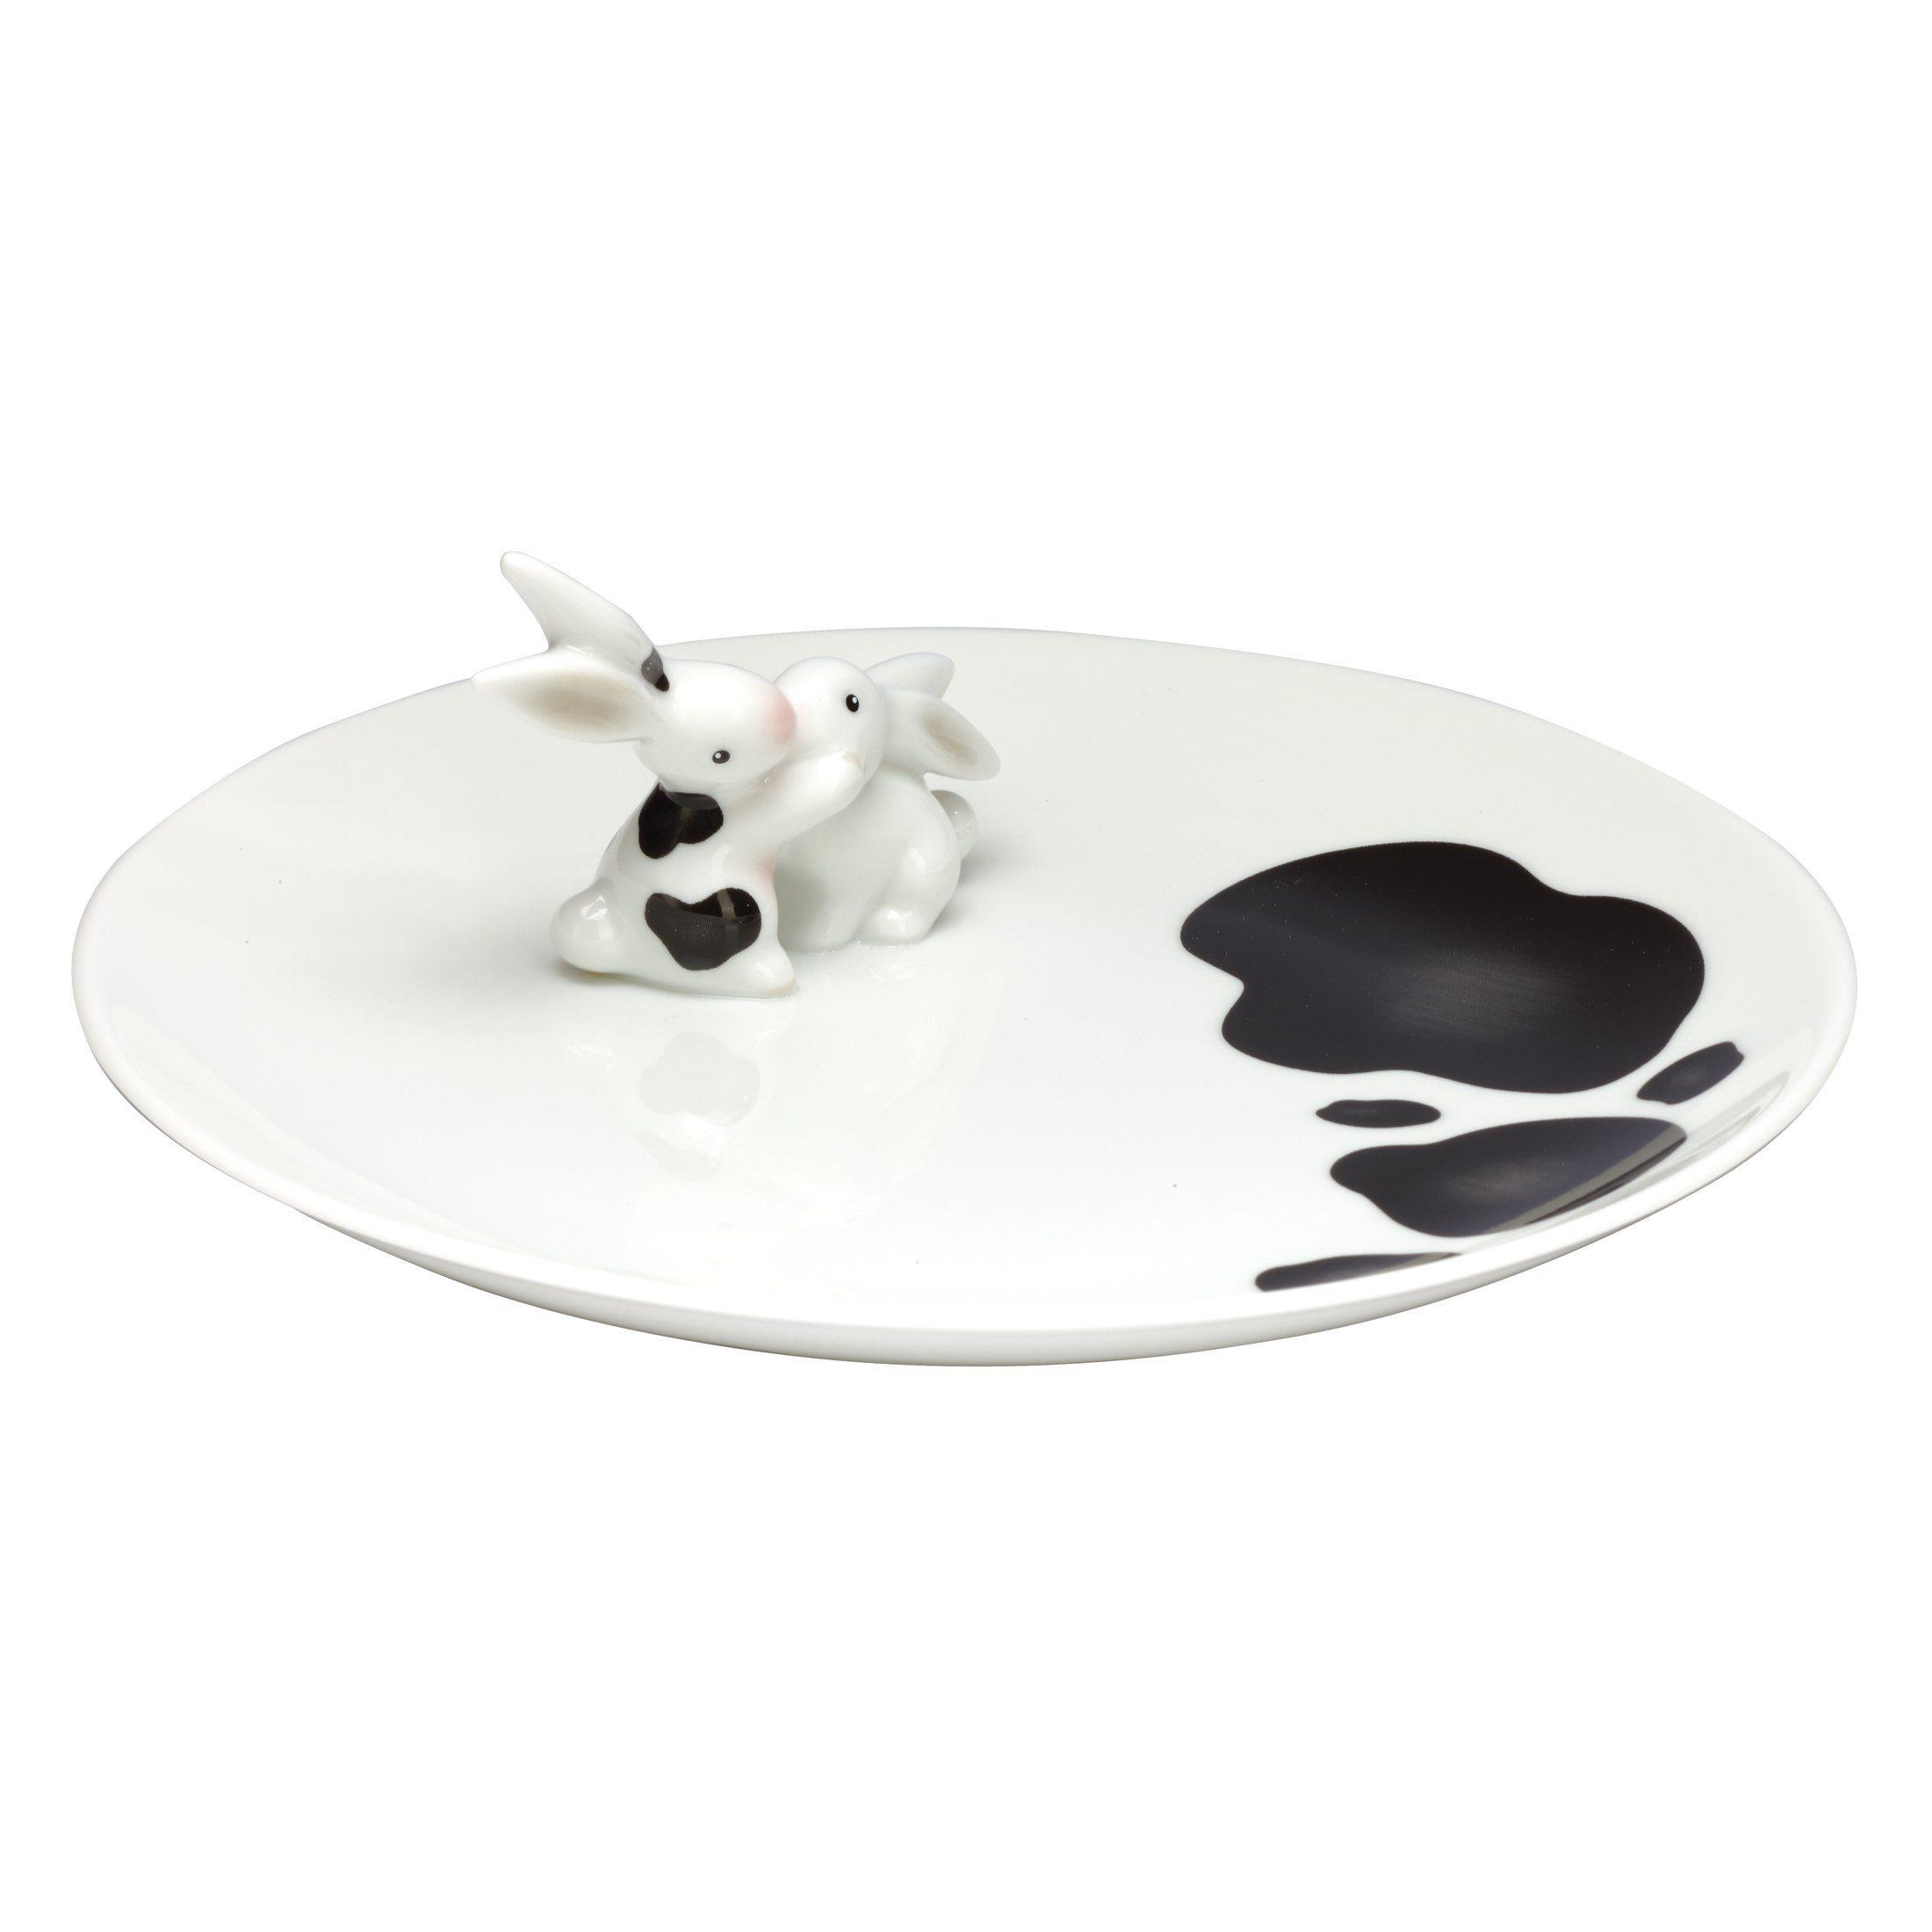 Goebel Cow Bunny - Porzellanteller »Bunny de luxe«